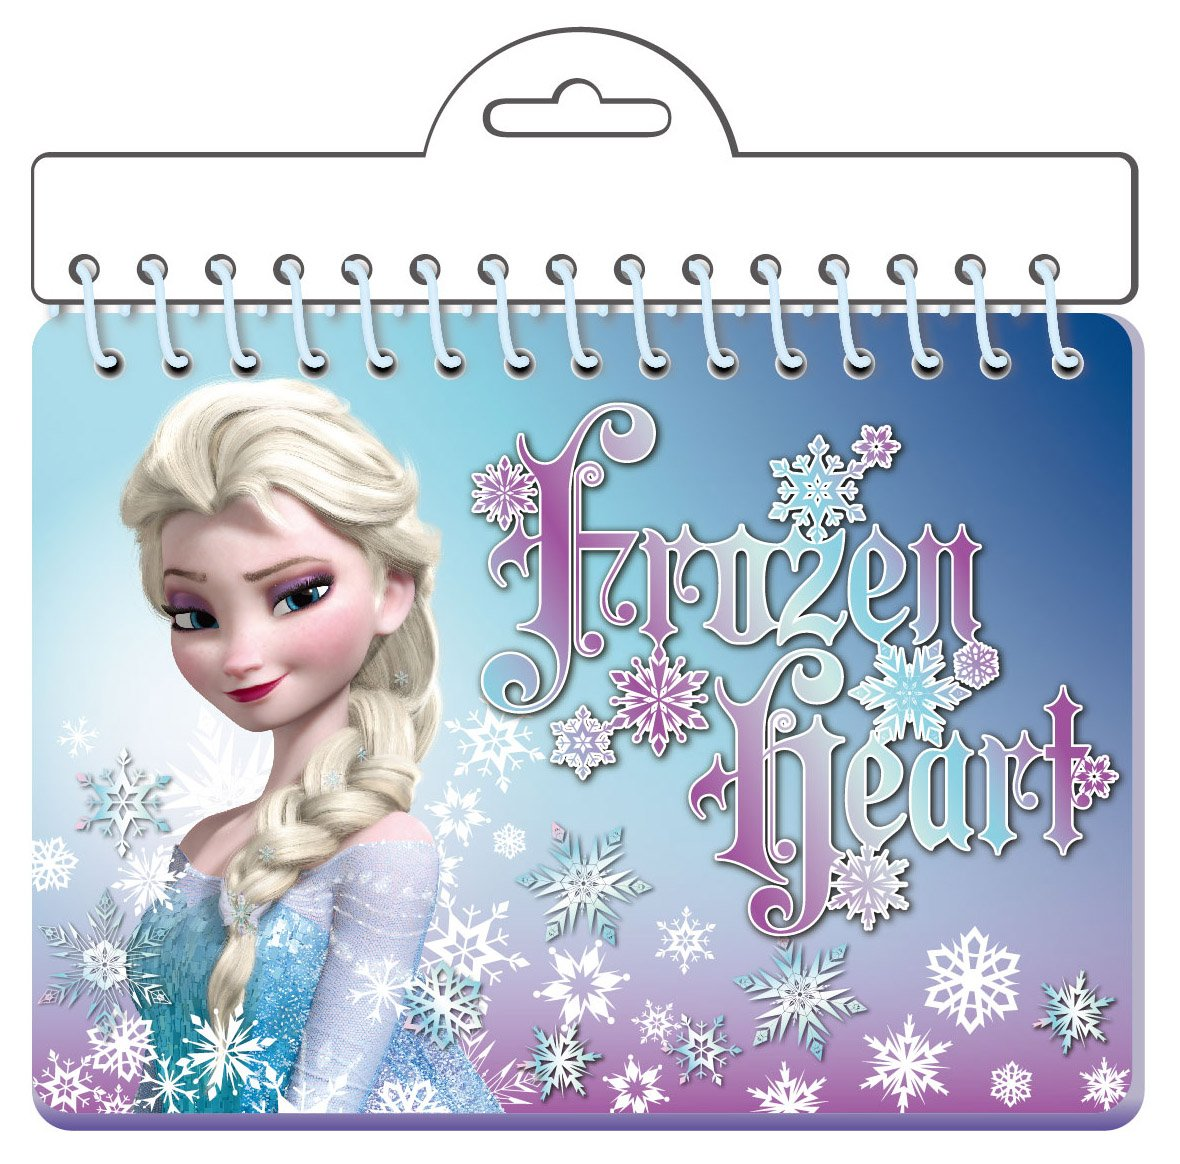 Disney Frozen Elsa Frozen Heart Autograph Book Monogram International 22233